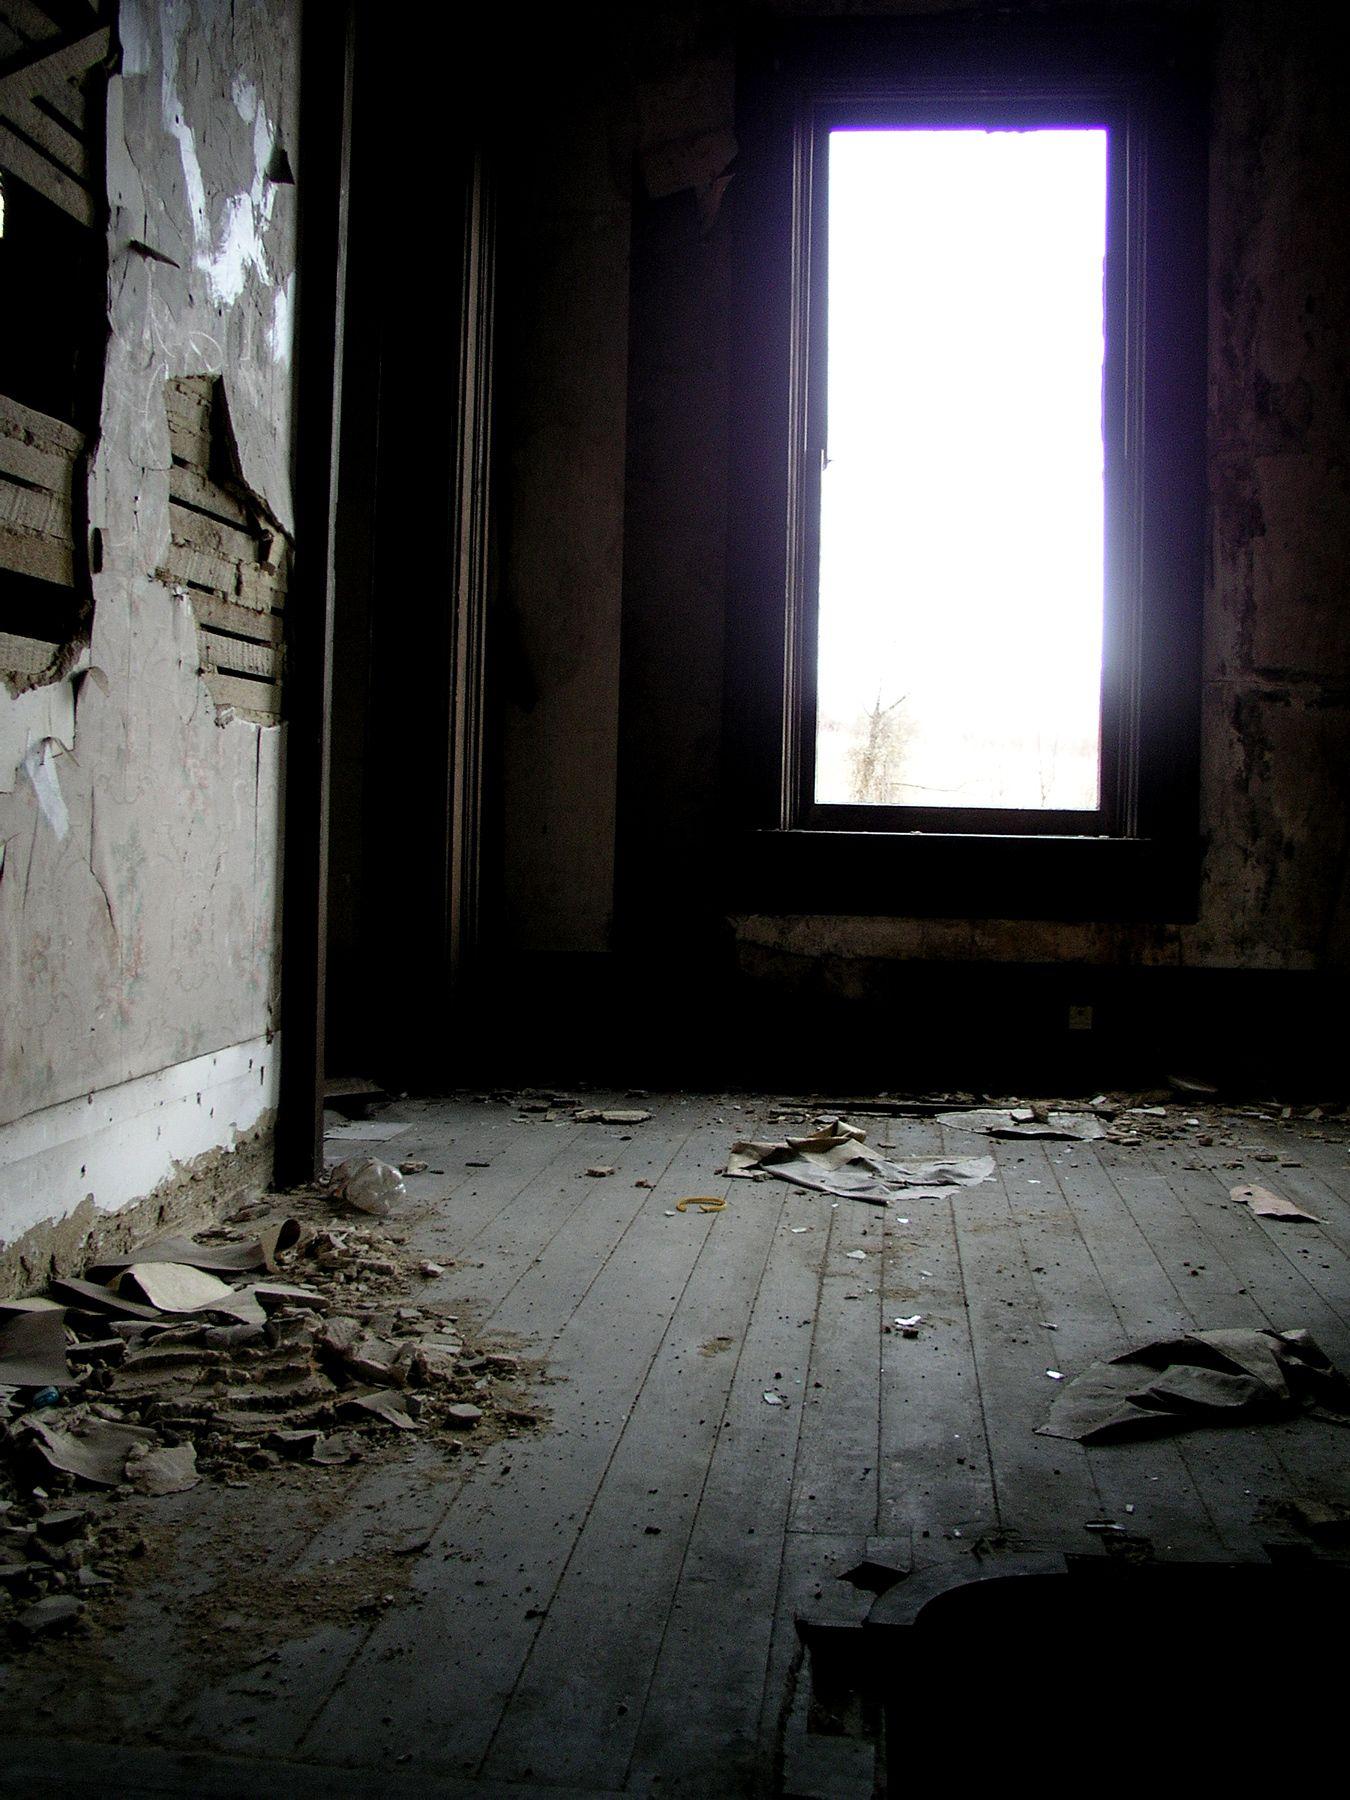 Dark empty room with window - Dark Room Google Search